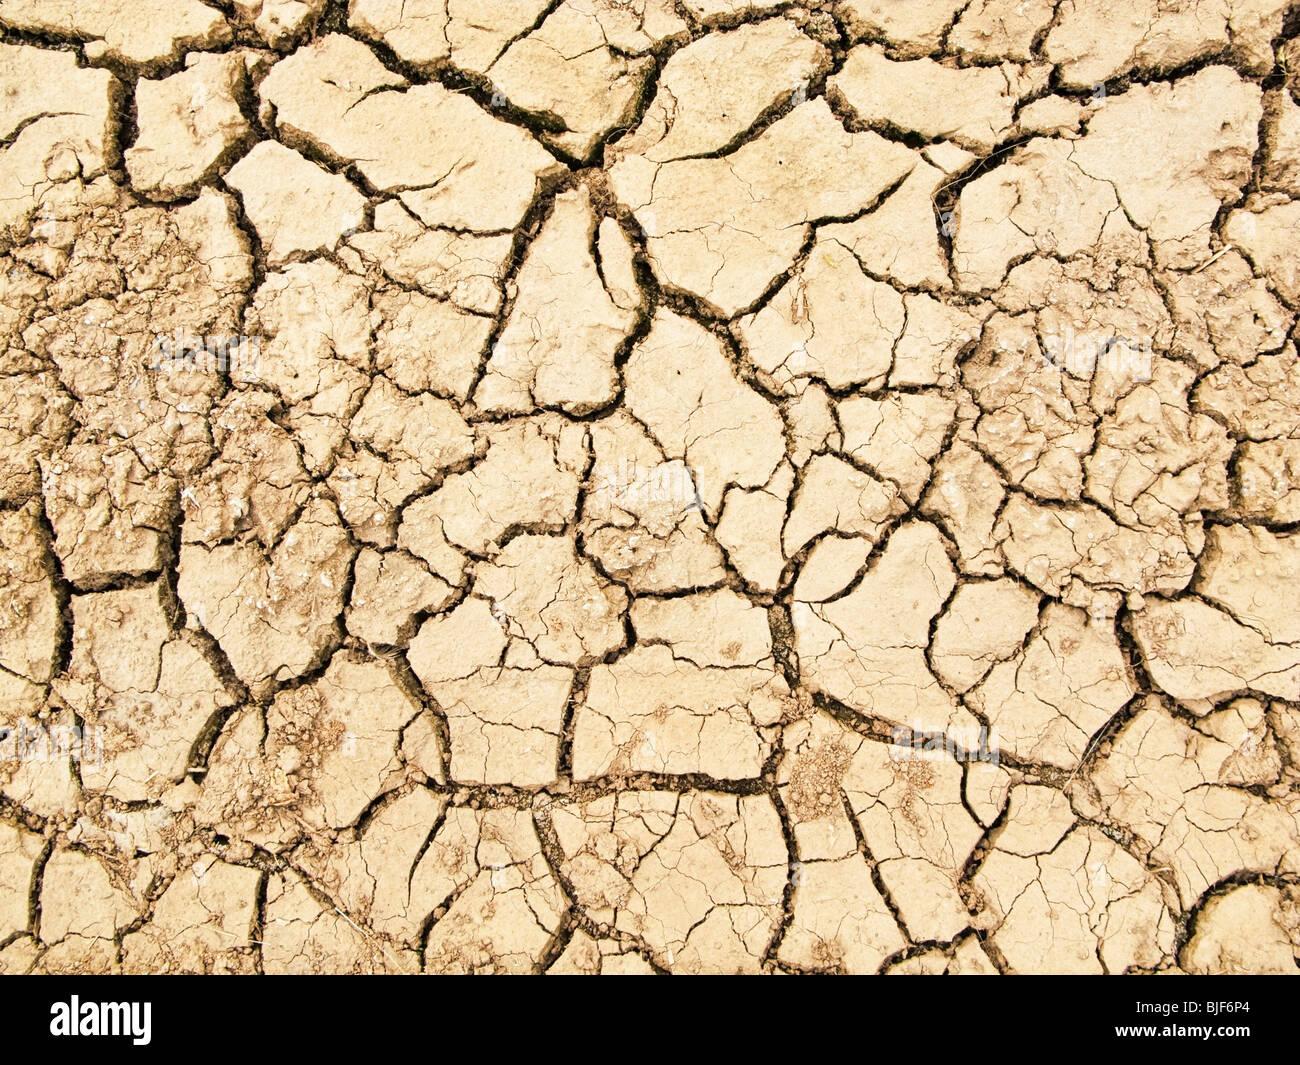 Masa seca agrietada Imagen De Stock